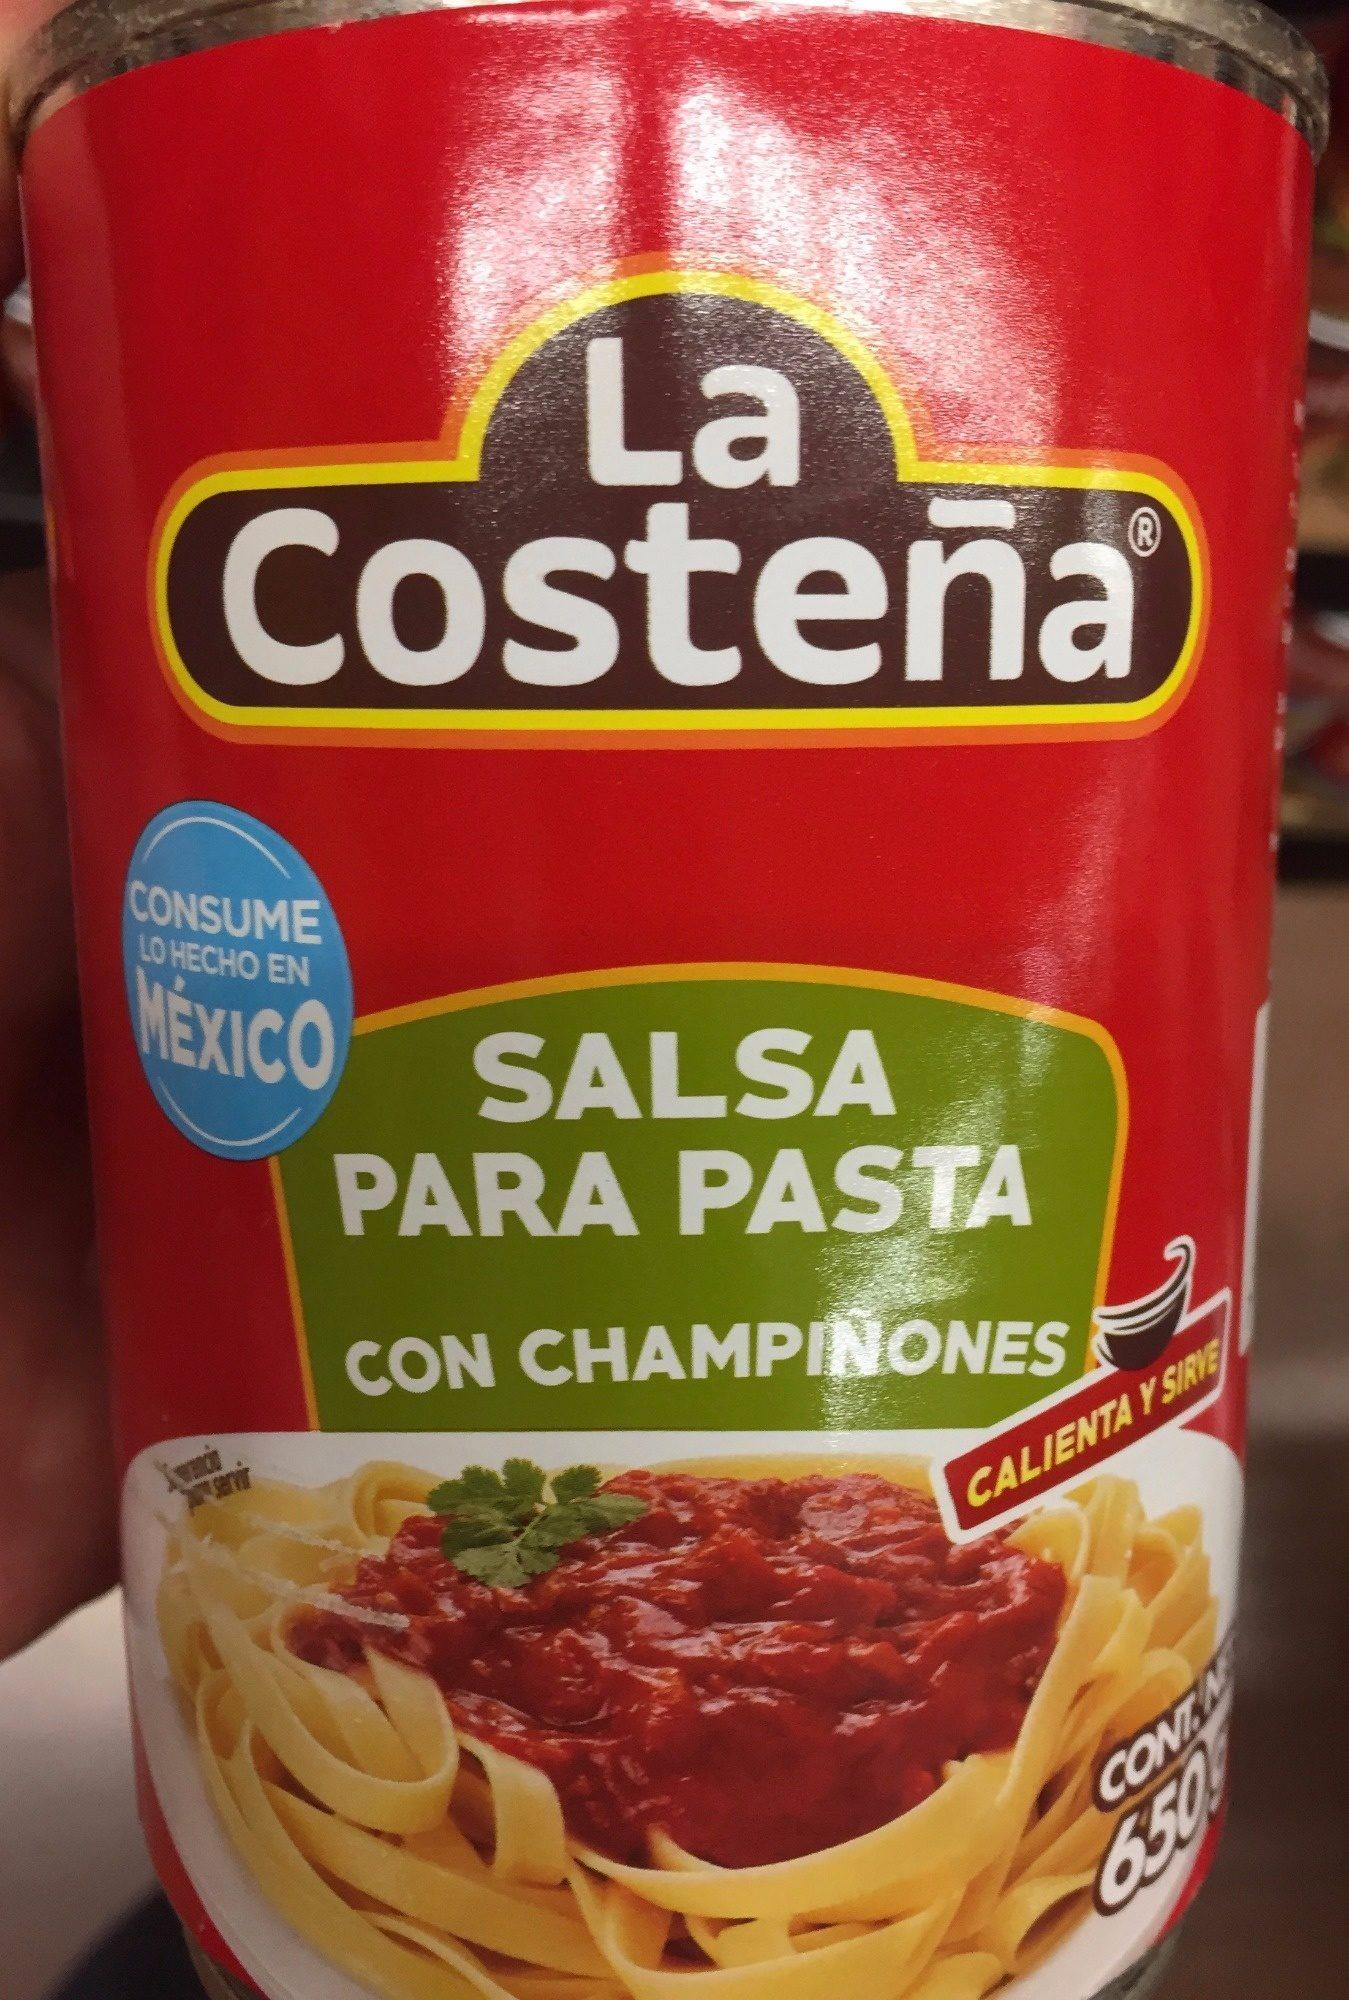 SALSA PARA PASTA CON CHAMPIÑONES - Product - es